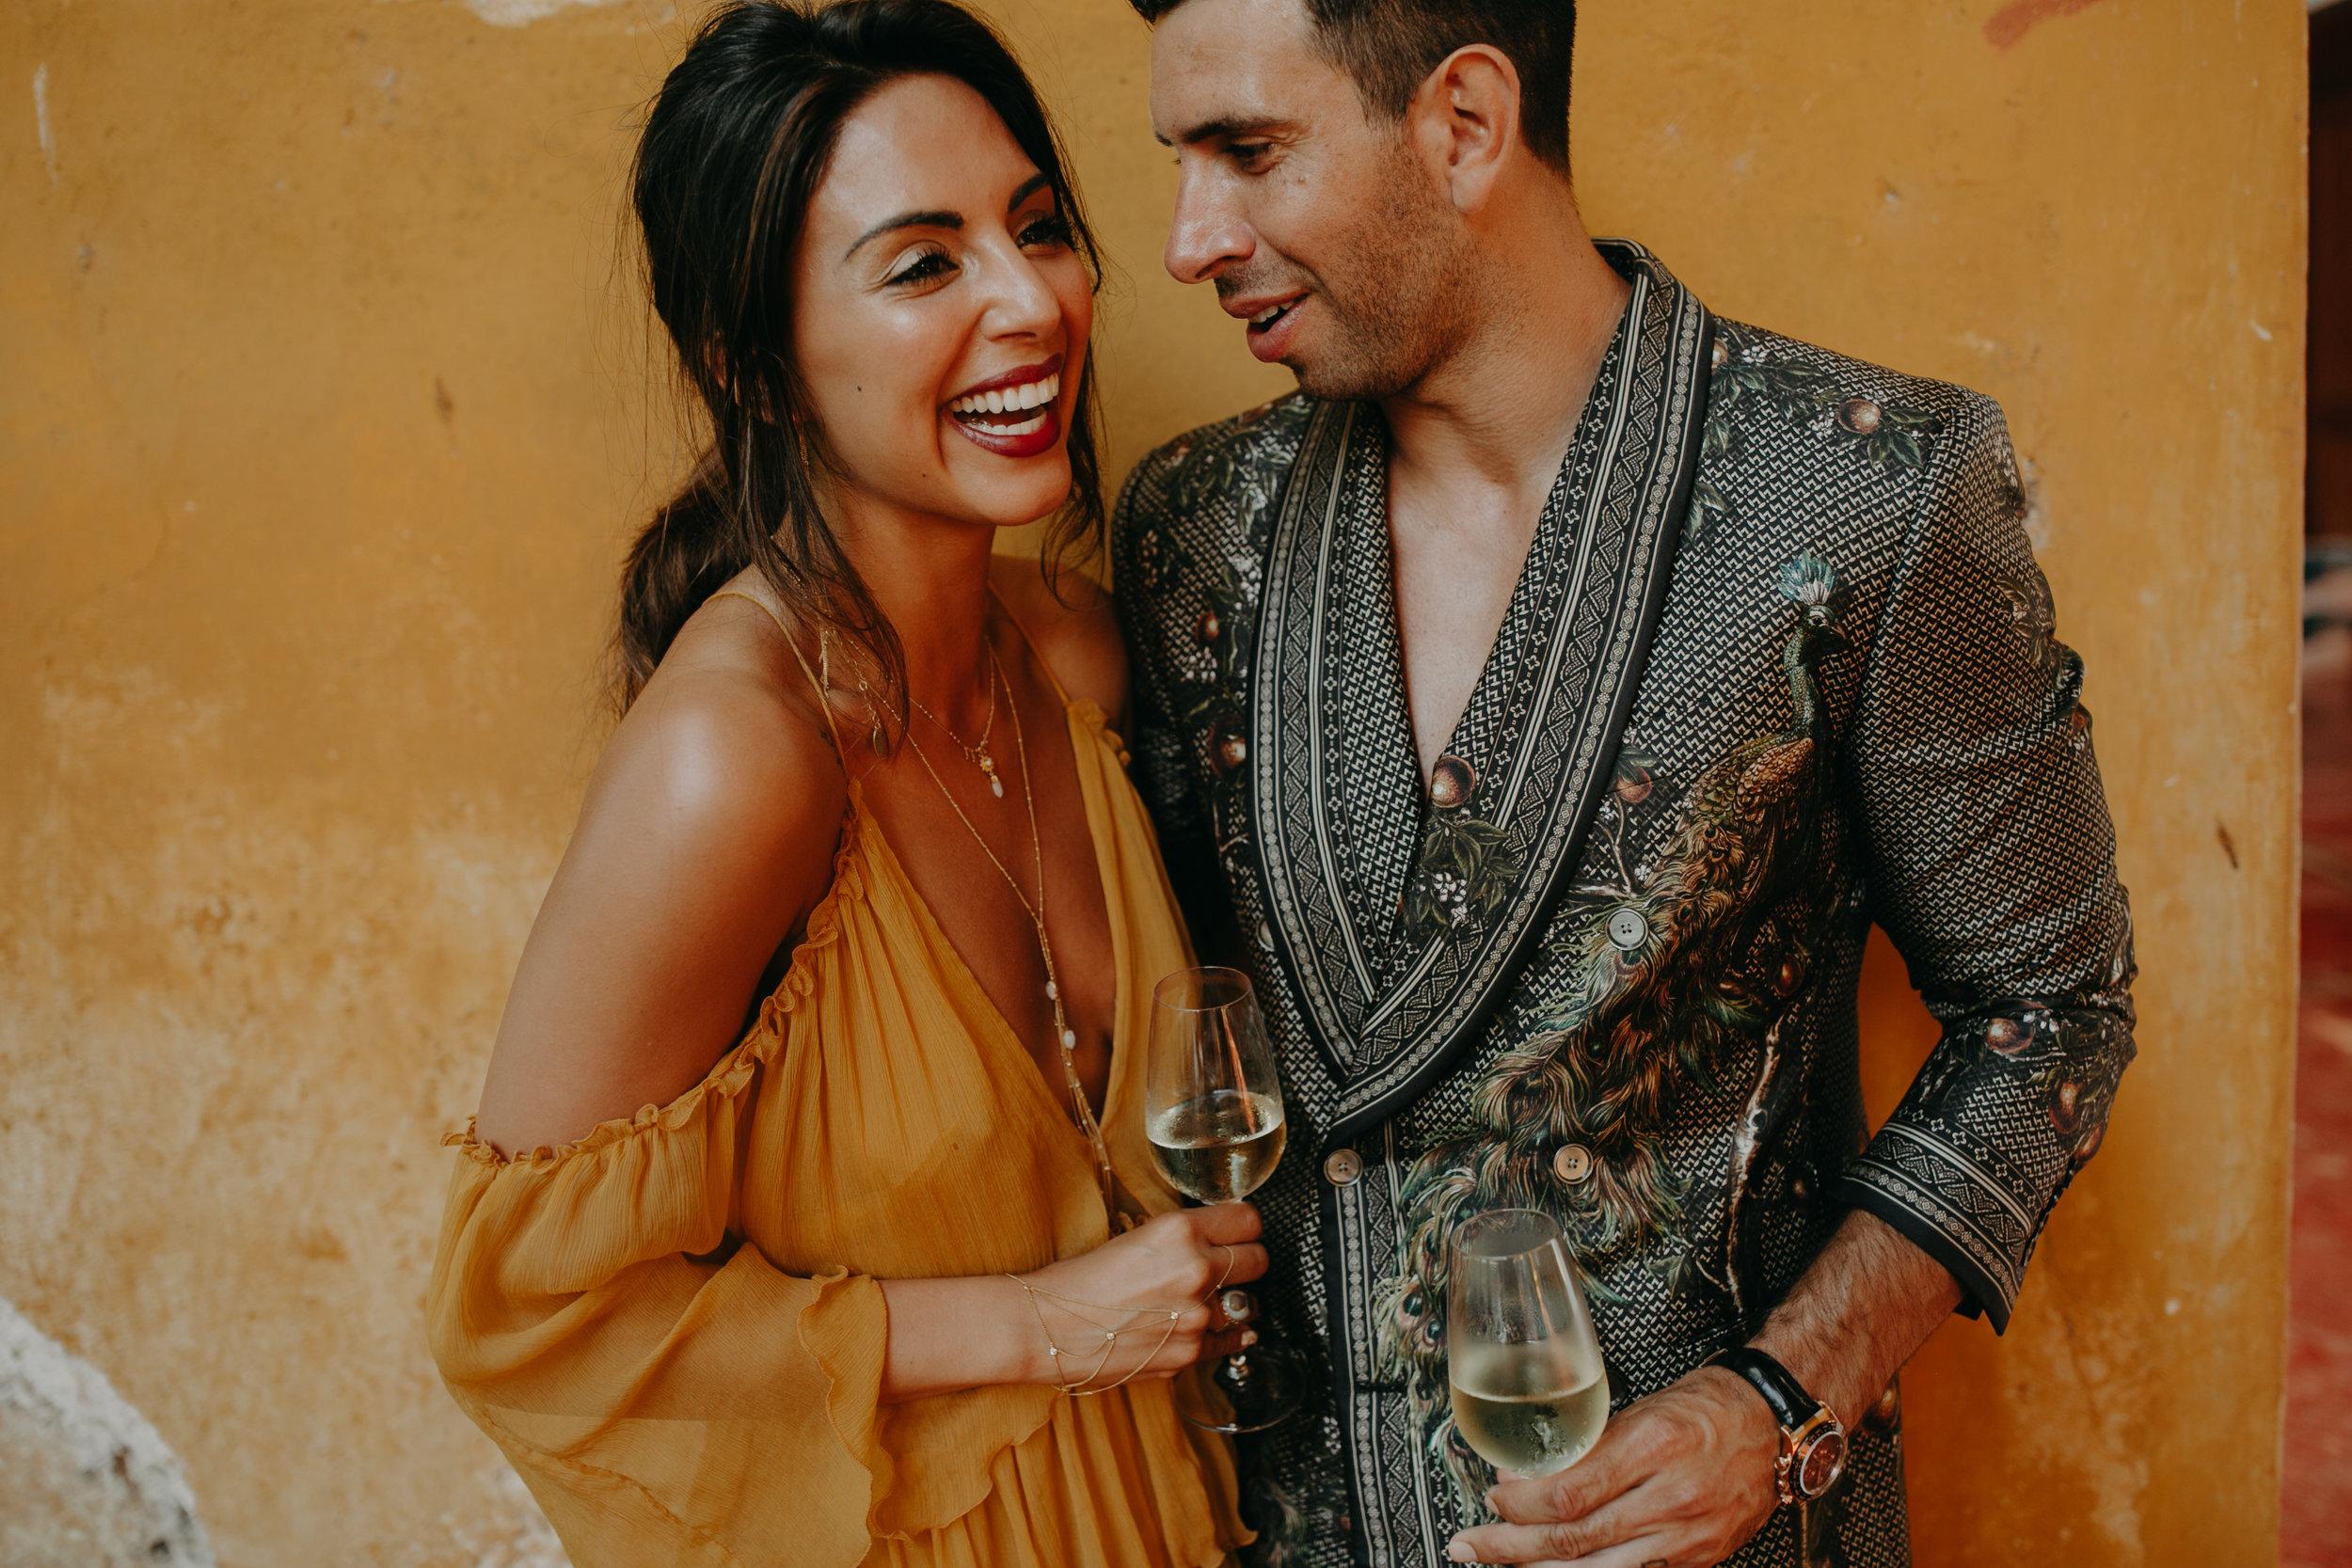 Hacienda Temozon Yucatan Mexico Wedding | Ida & Peter Emily Magers Photography-131.jpg